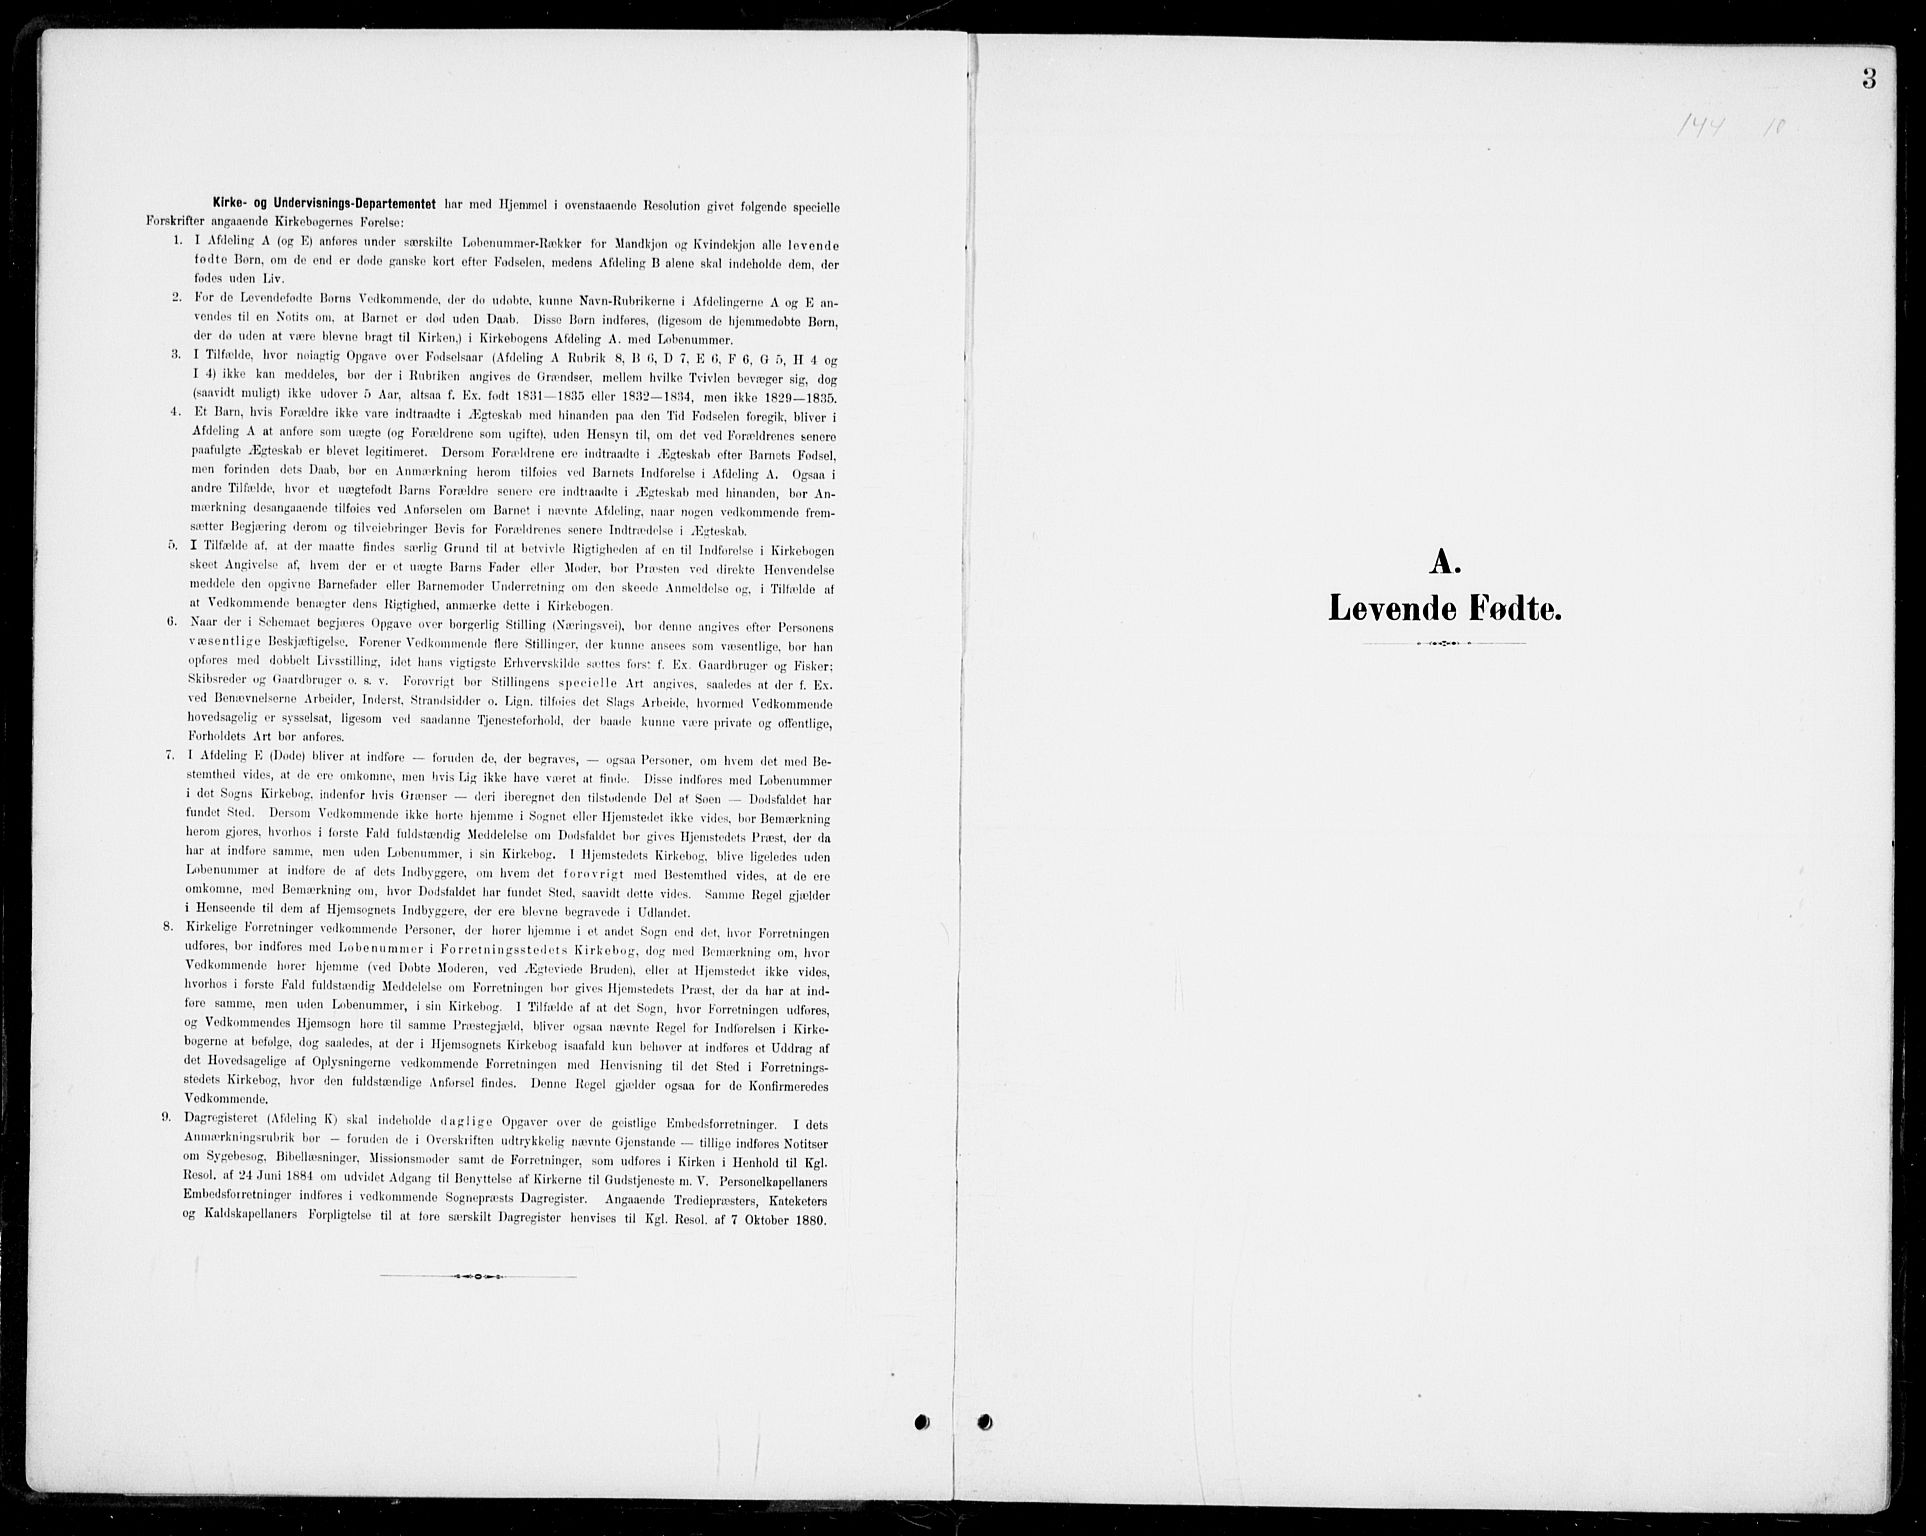 SAKO, Modum kirkebøker, G/Gb/L0001: Klokkerbok nr. II 1, 1901-1942, s. 3